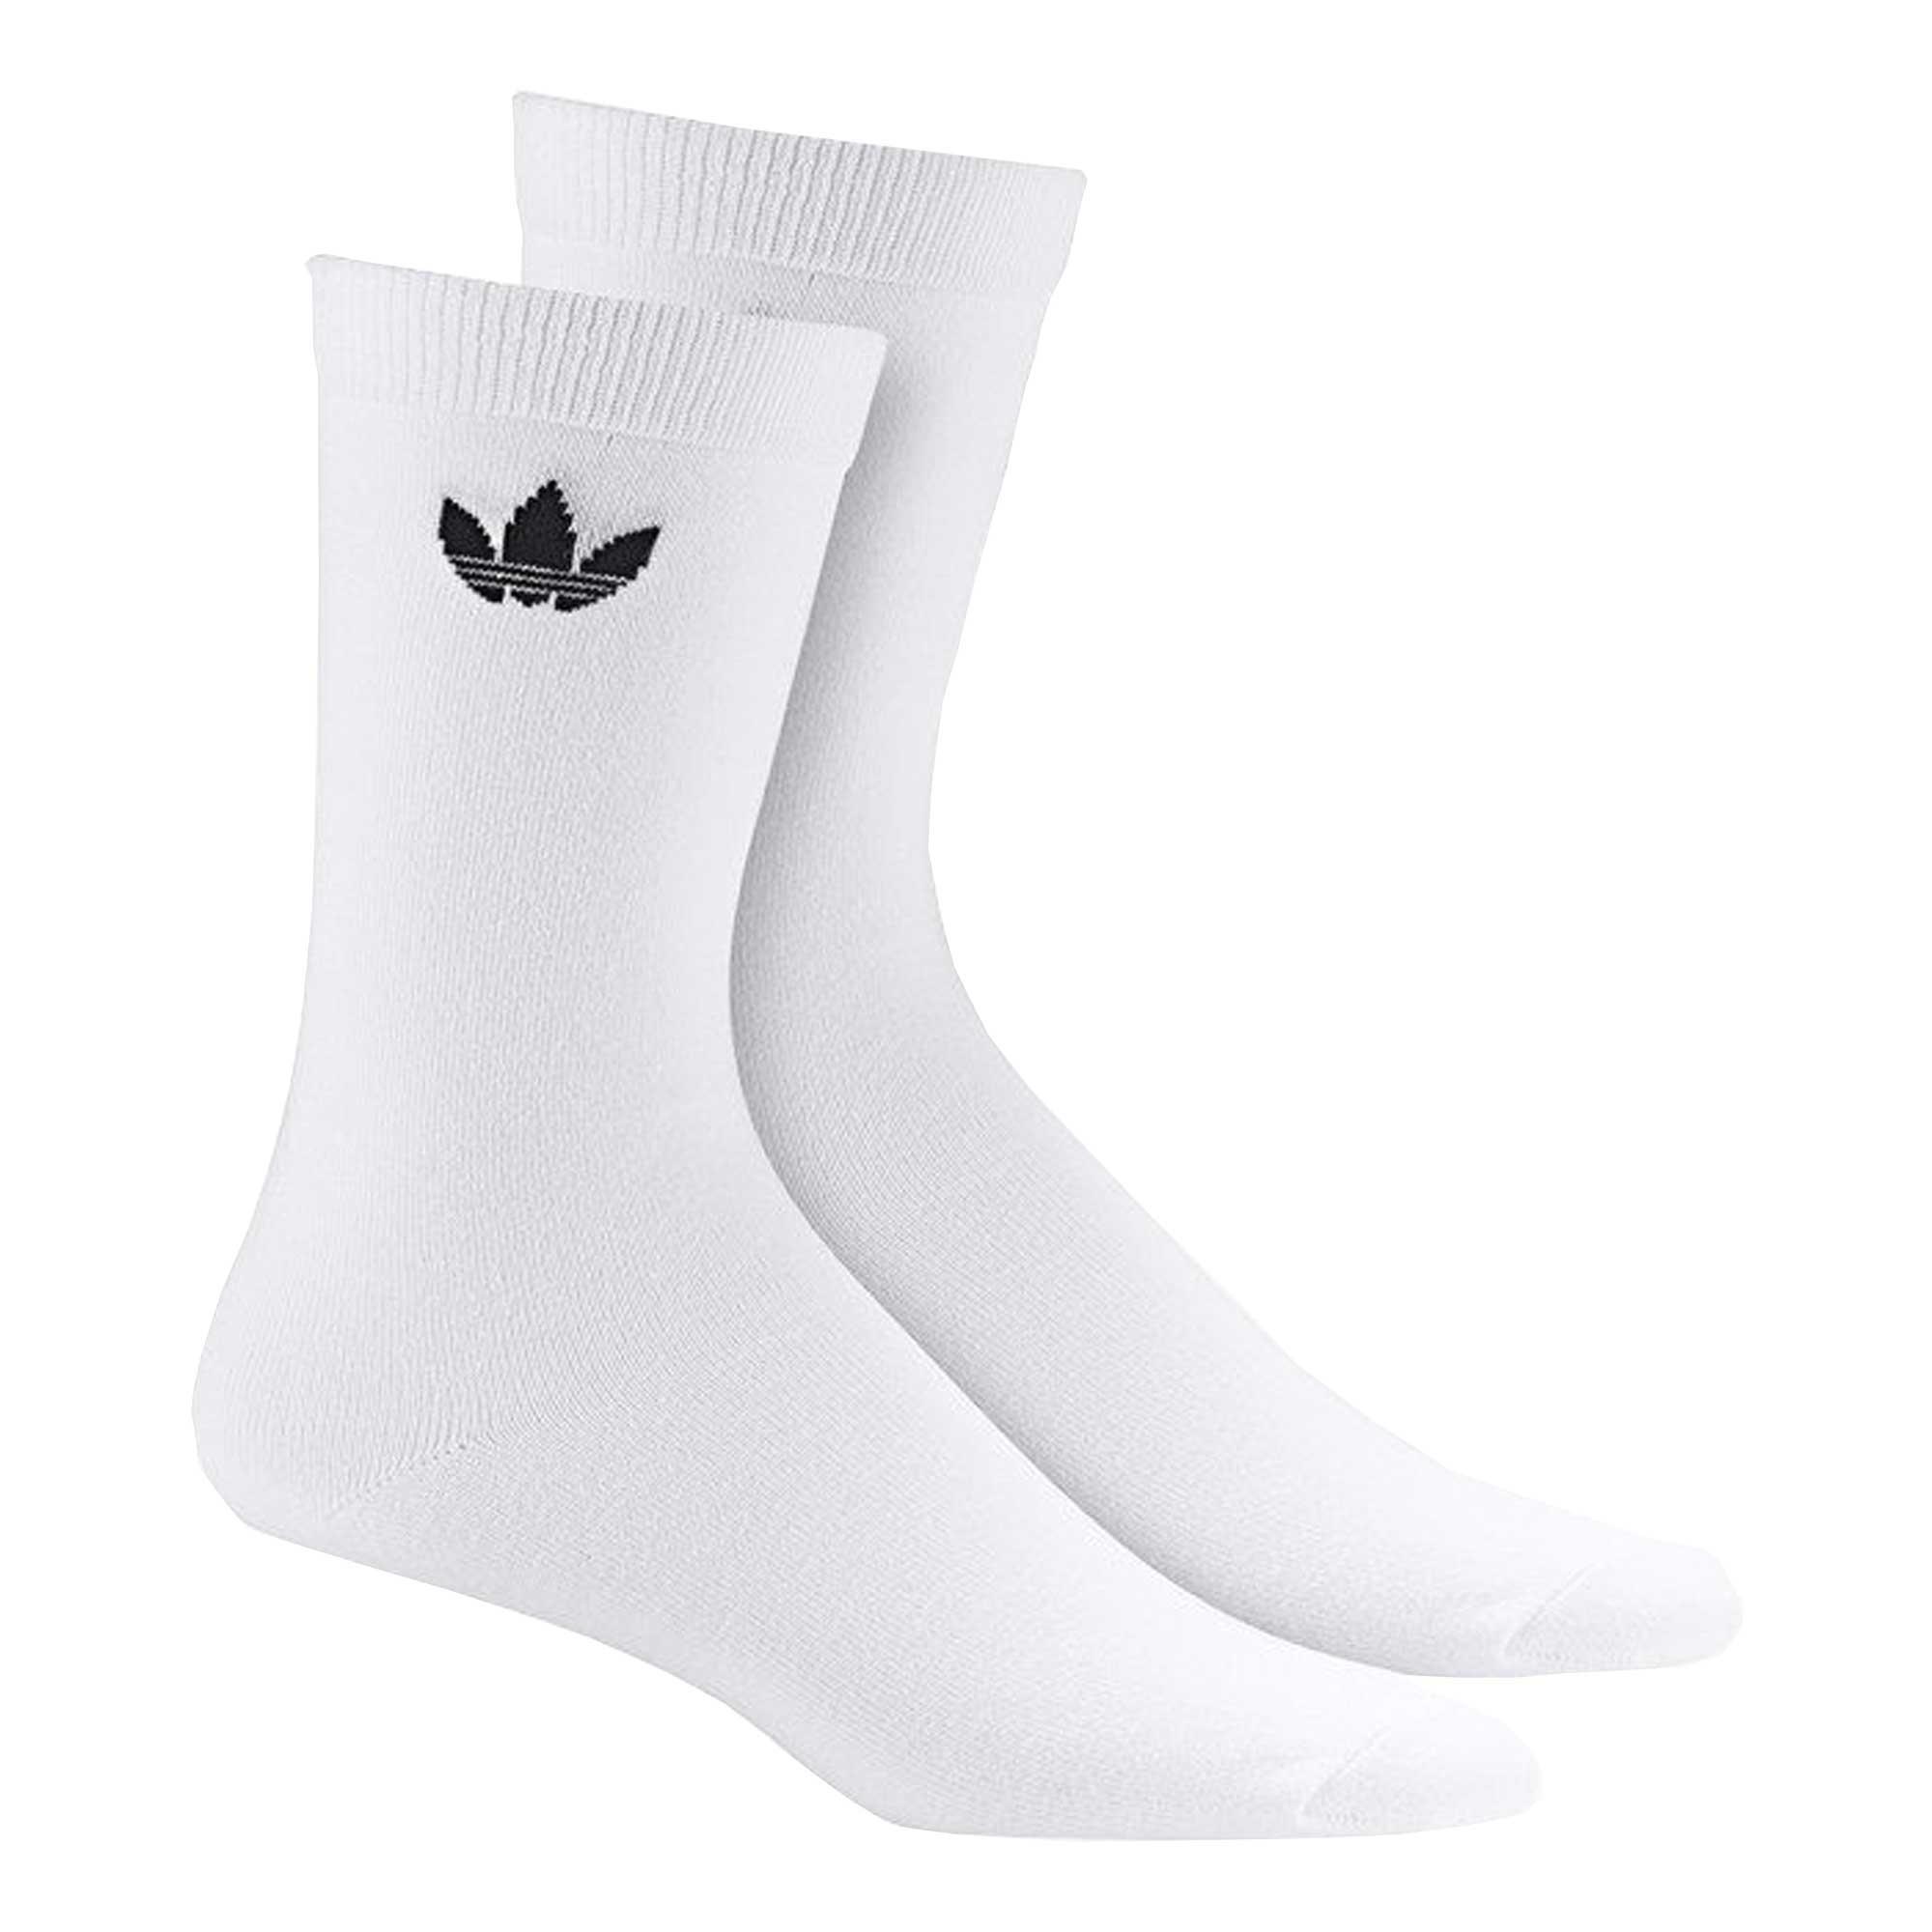 Adidas Originals Thin Trefoil Crew Socks 2 Pairs - White